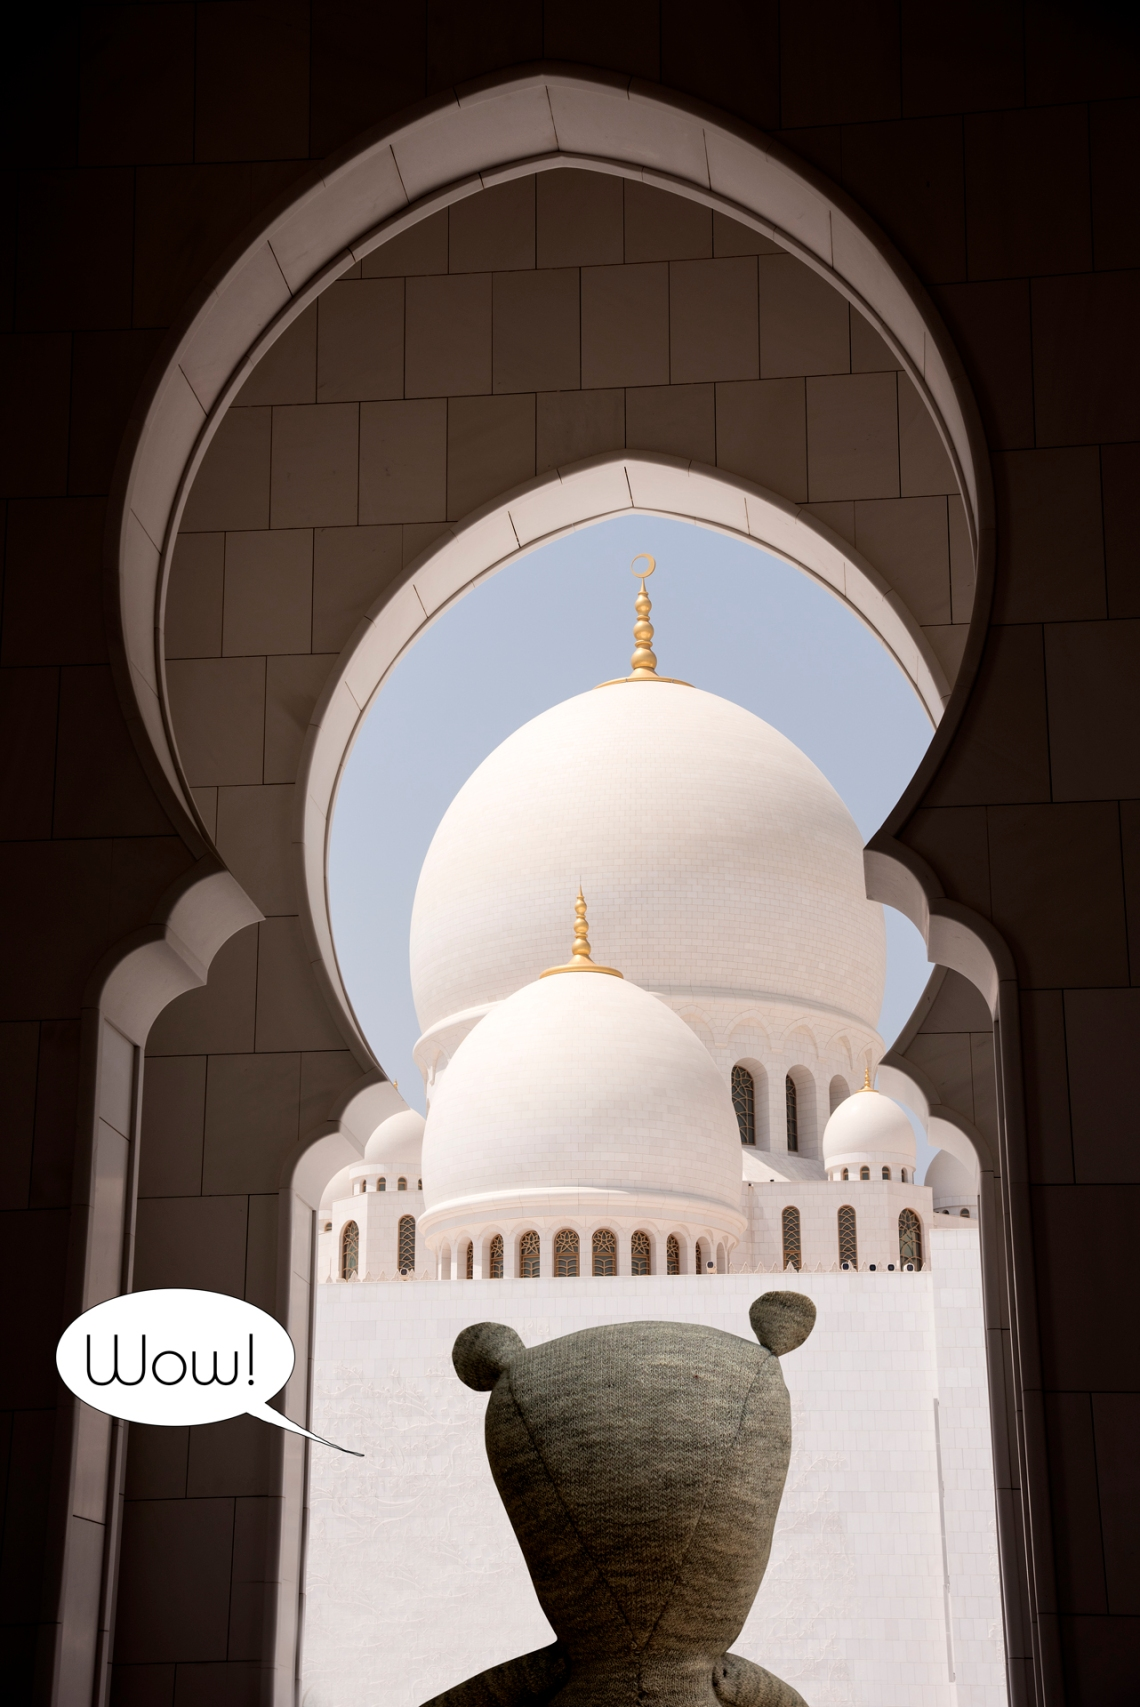 7-Louis mosquée fayed a abu dhabi